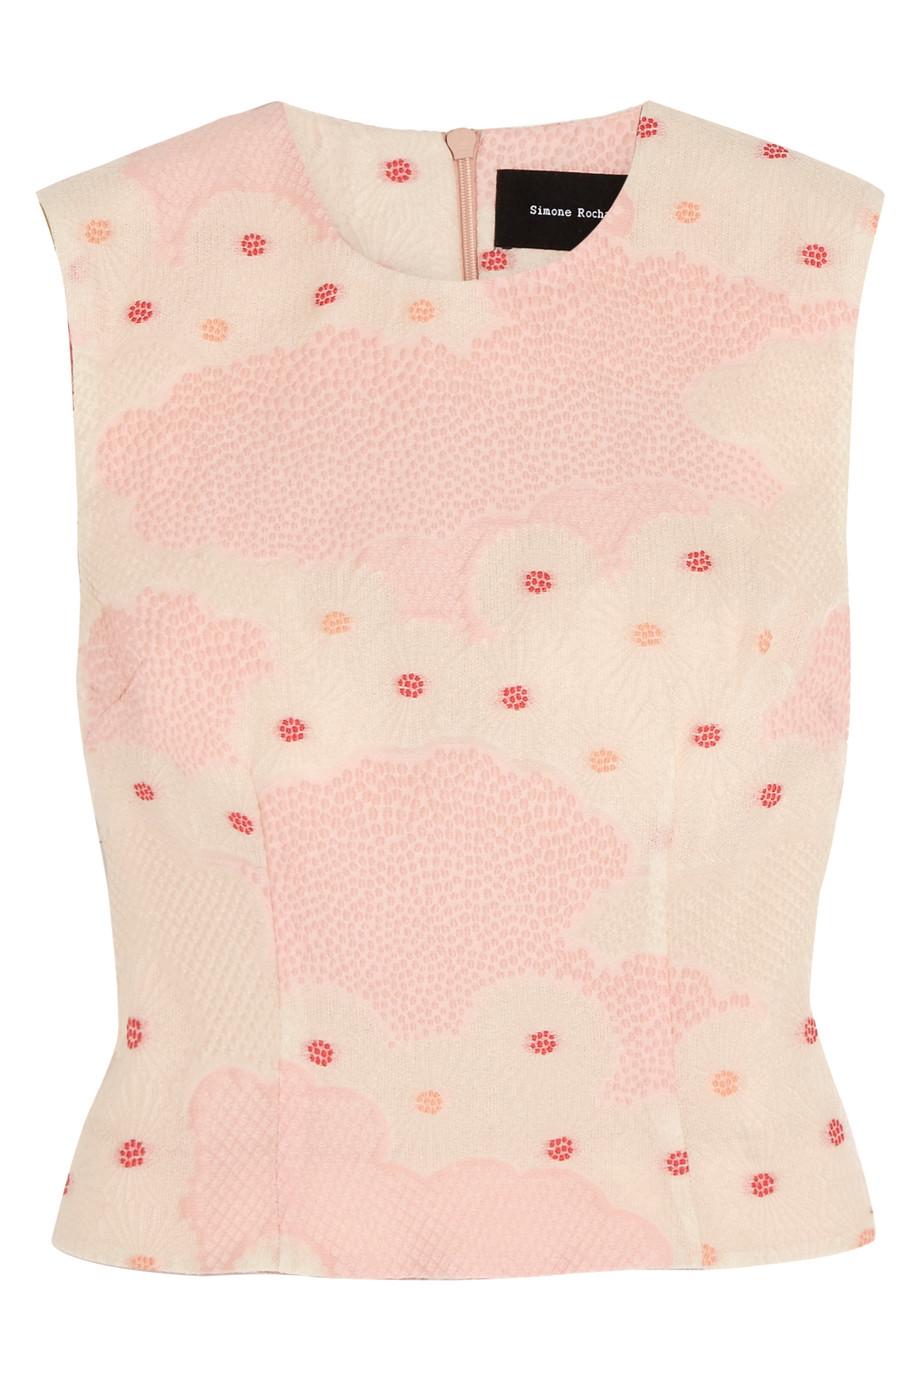 Simone Rocha Cloqué Top, Pink, Women's, Size: 6